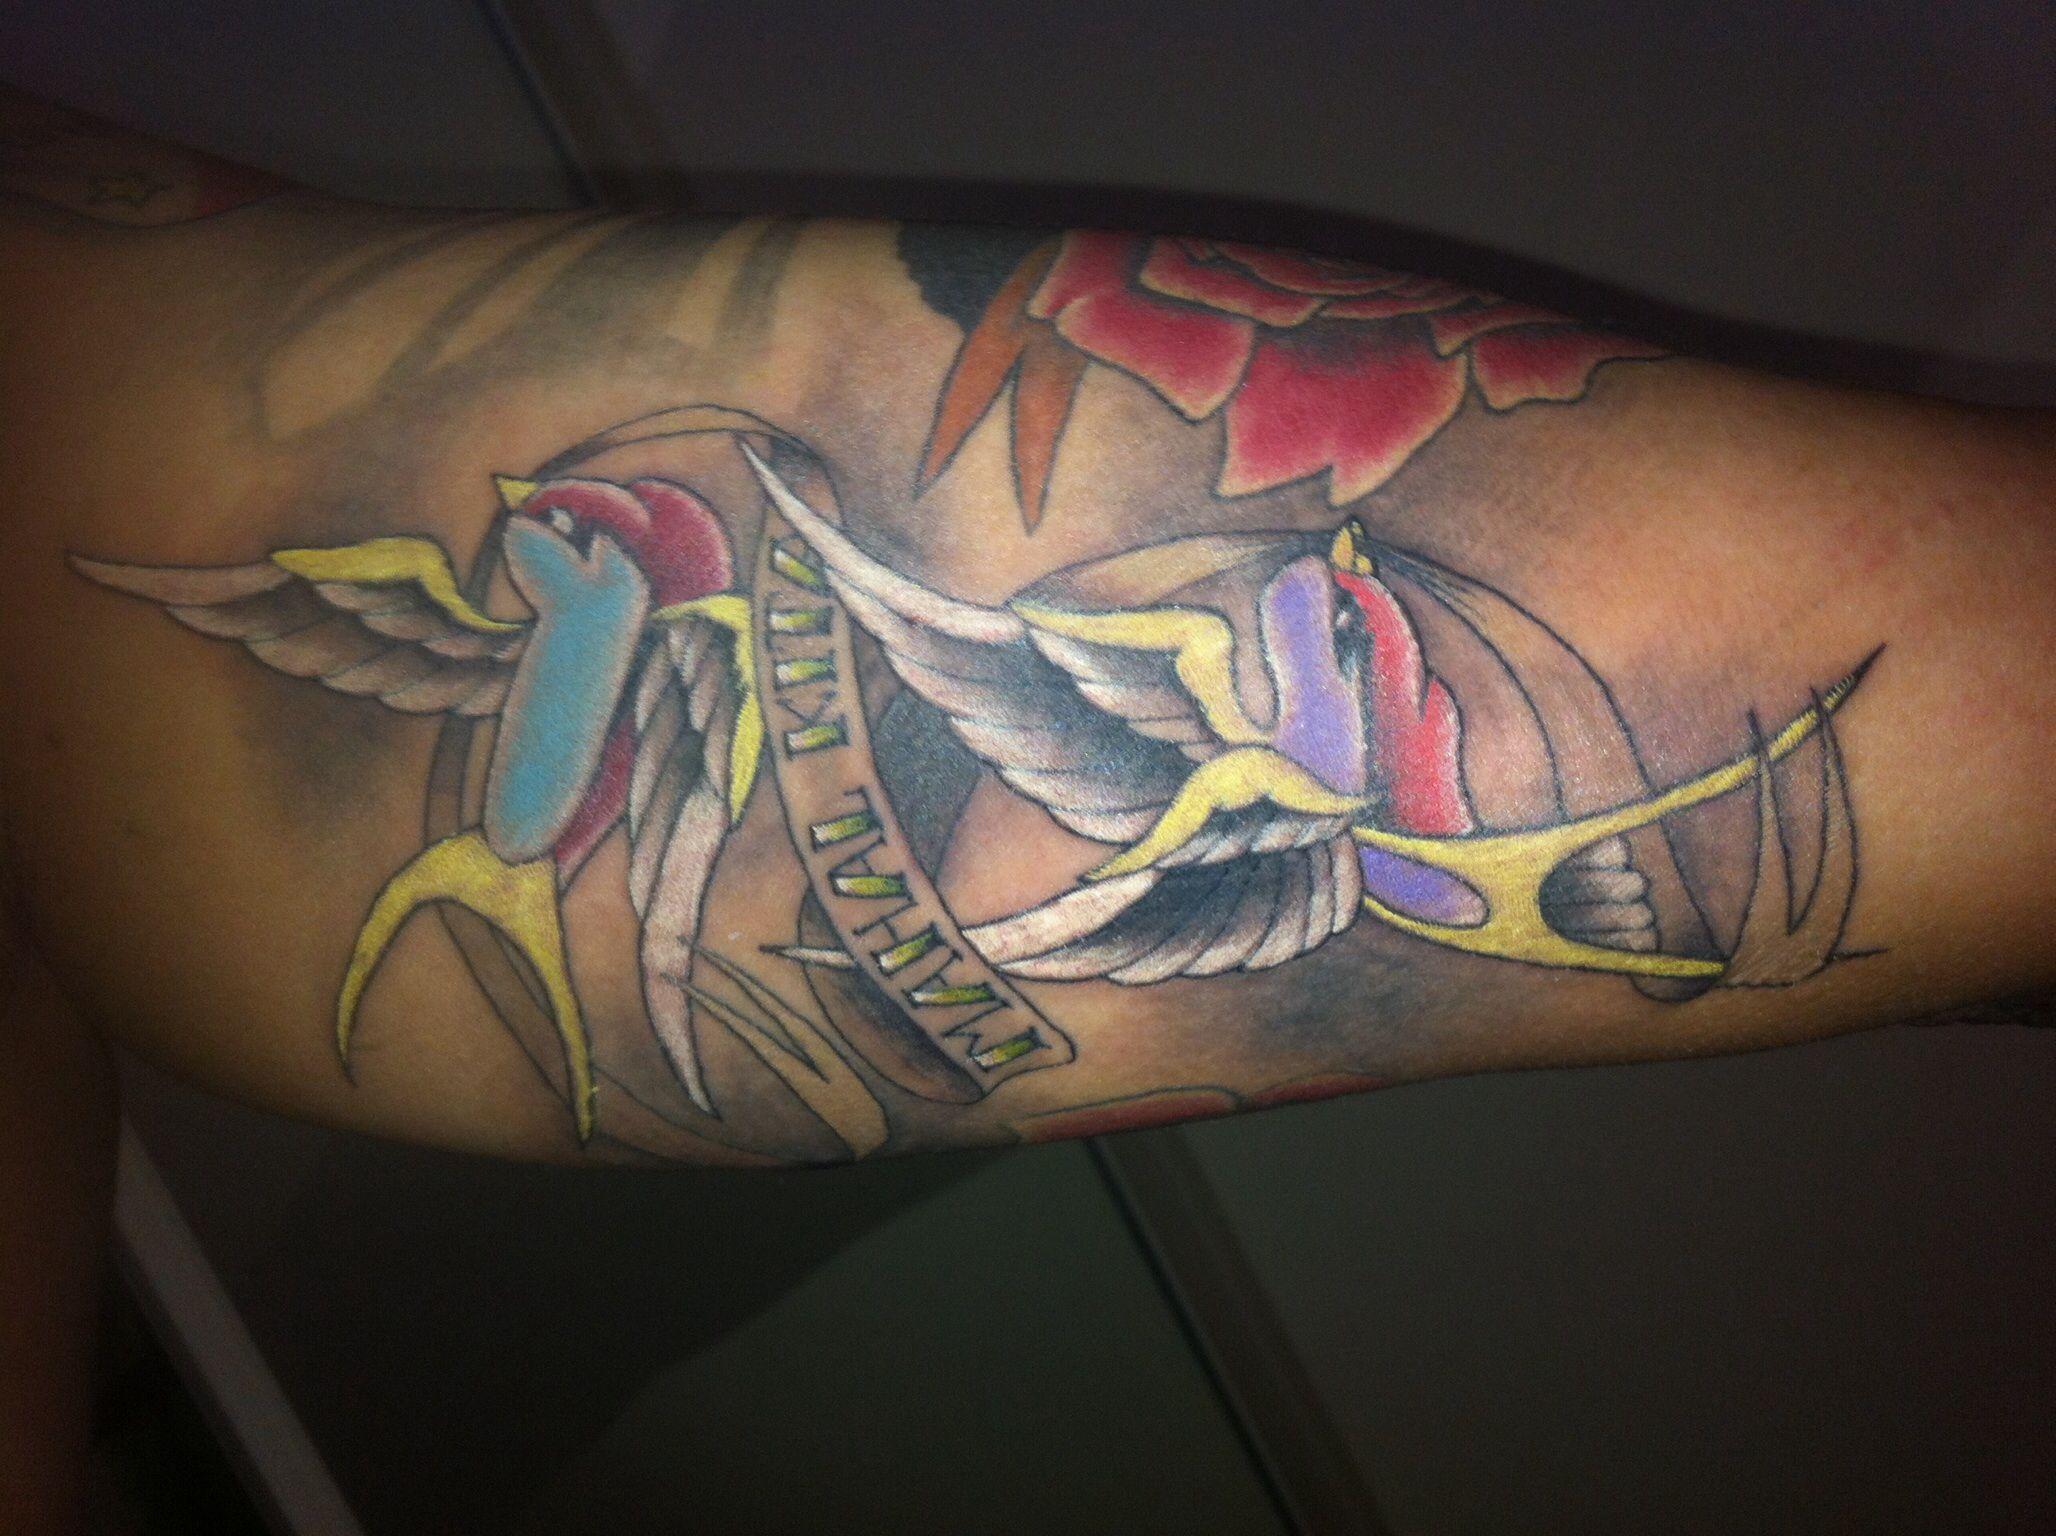 Swallows Tattoo Mahal Kita I Love You Filipino Tattoo Ideas  # Muebles Tagalog